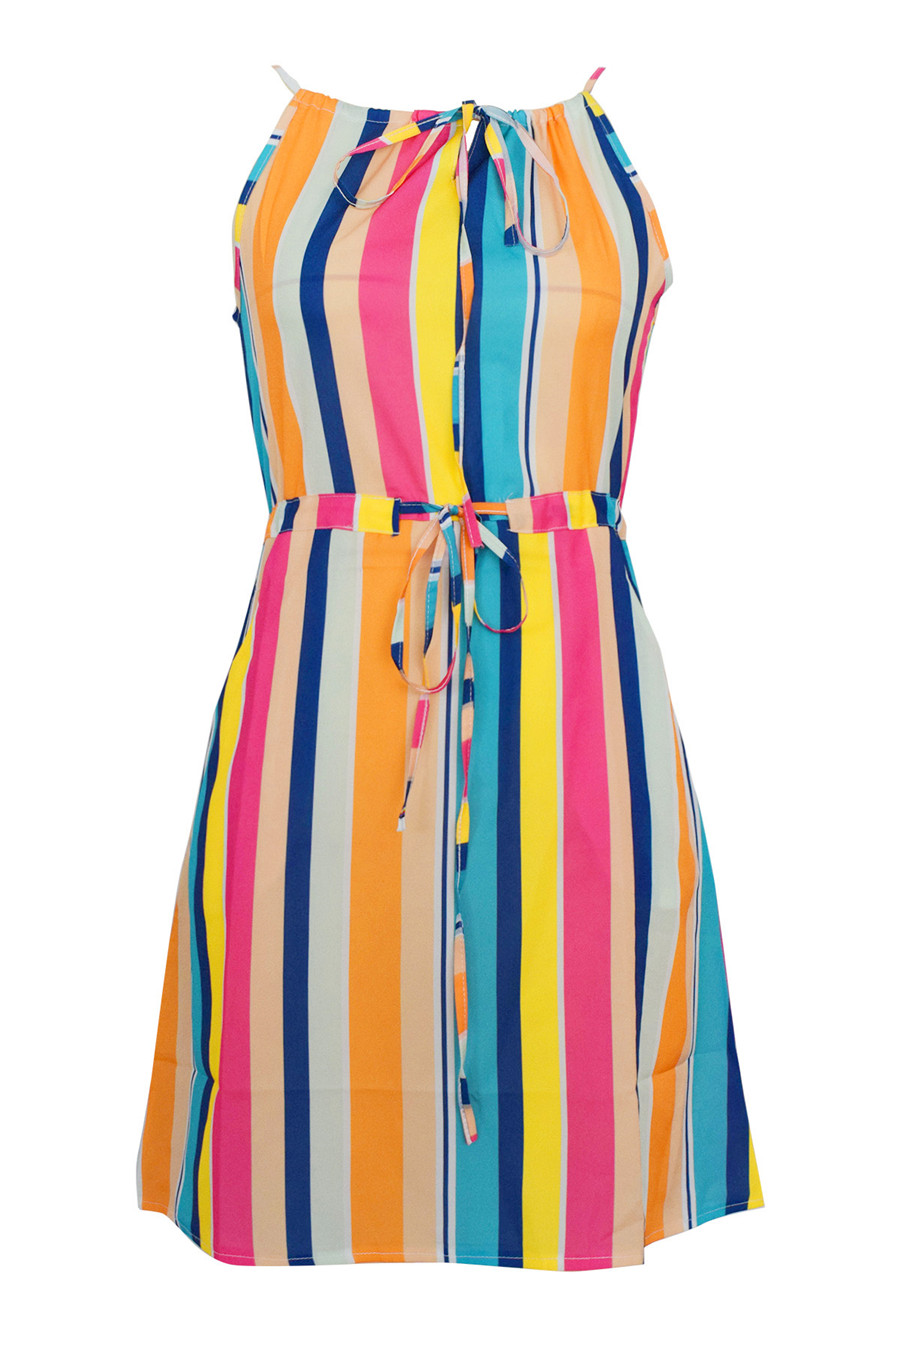 Gladiolus Chiffon Women Summer Dress Spaghetti Strap Floral Print Pocket Sexy Bohemian Beach Dress 2019 Short Ladies Dresses (24)